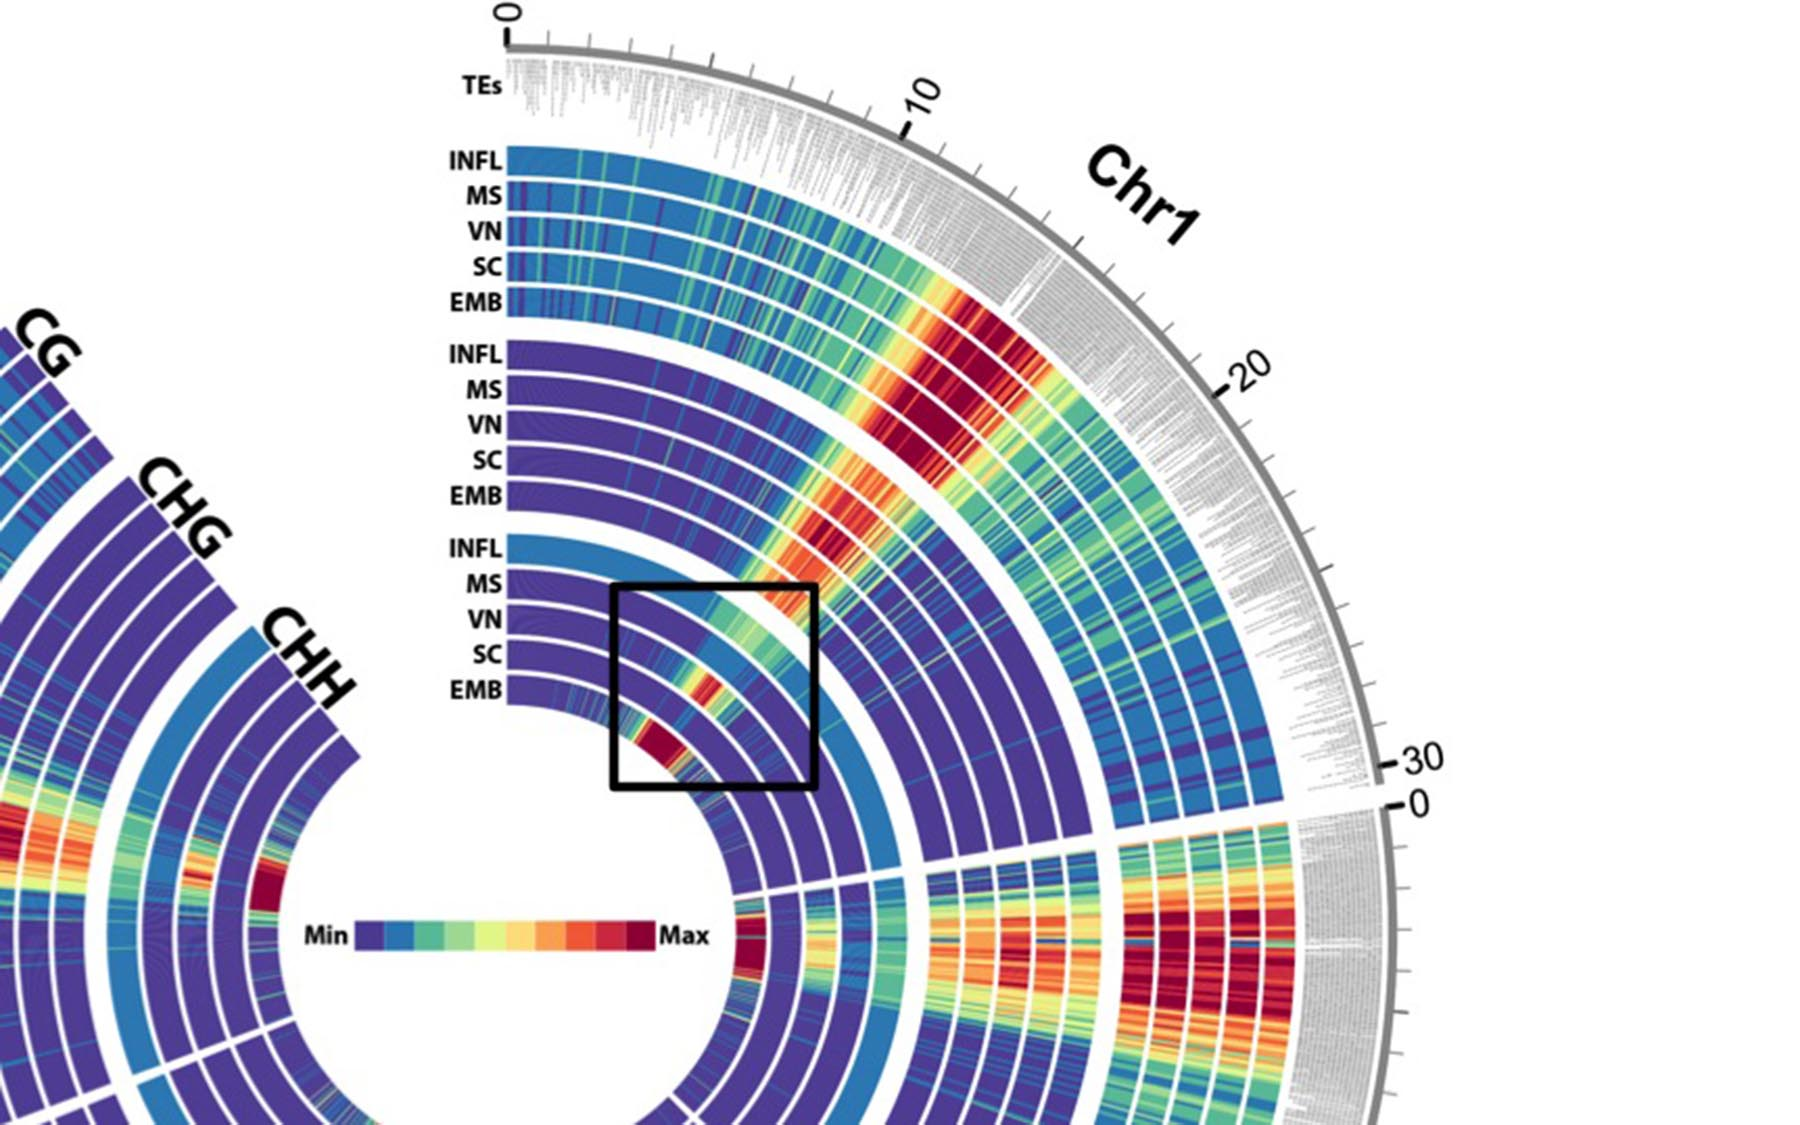 Cell heat map Martienssen